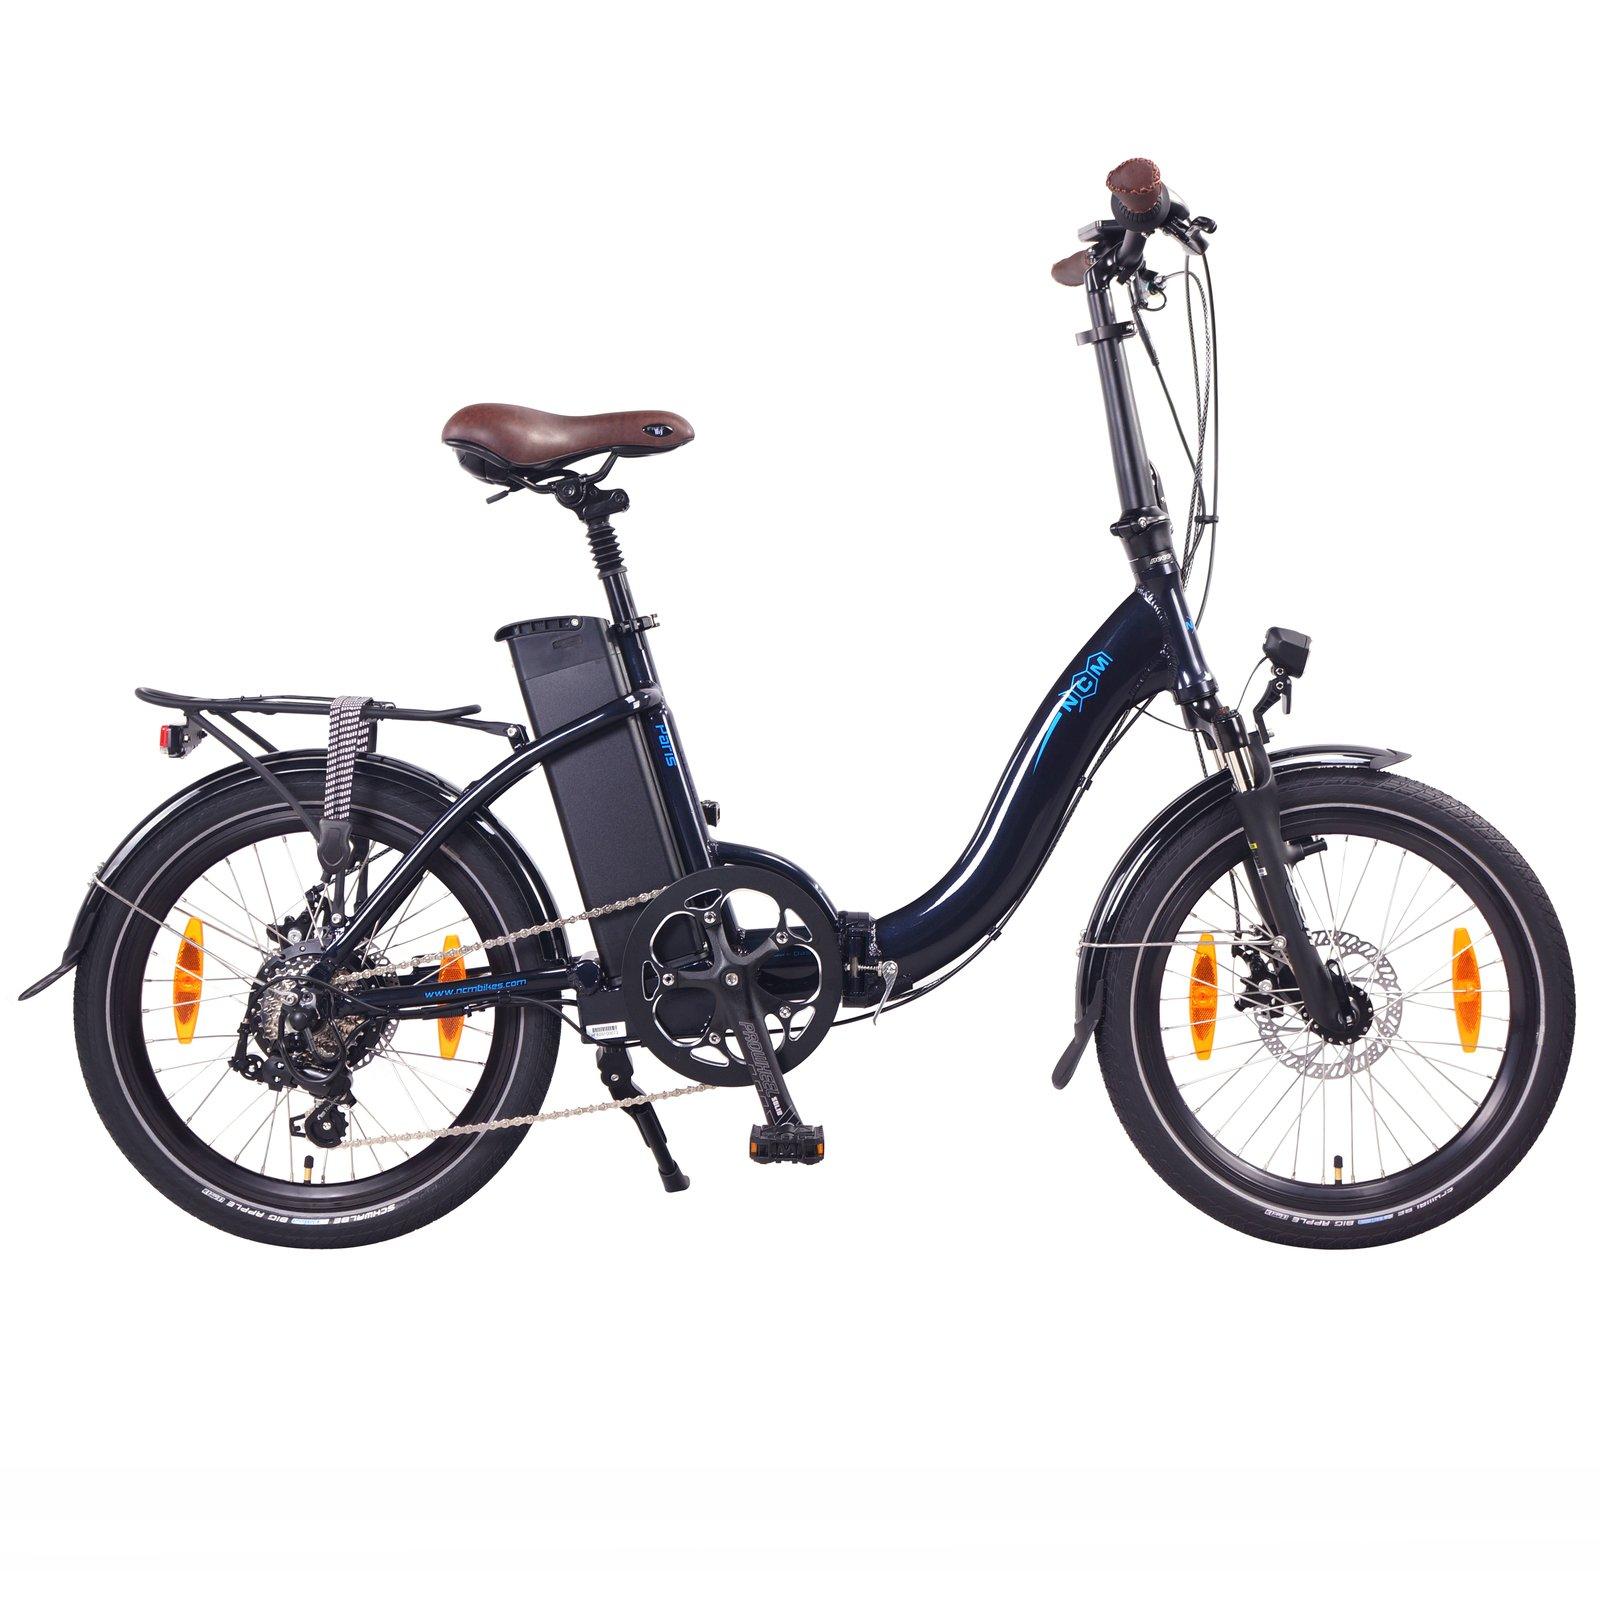 NCM Paris+ Folding E-Bike, 250W, 36V 19Ah 684Wh Battery